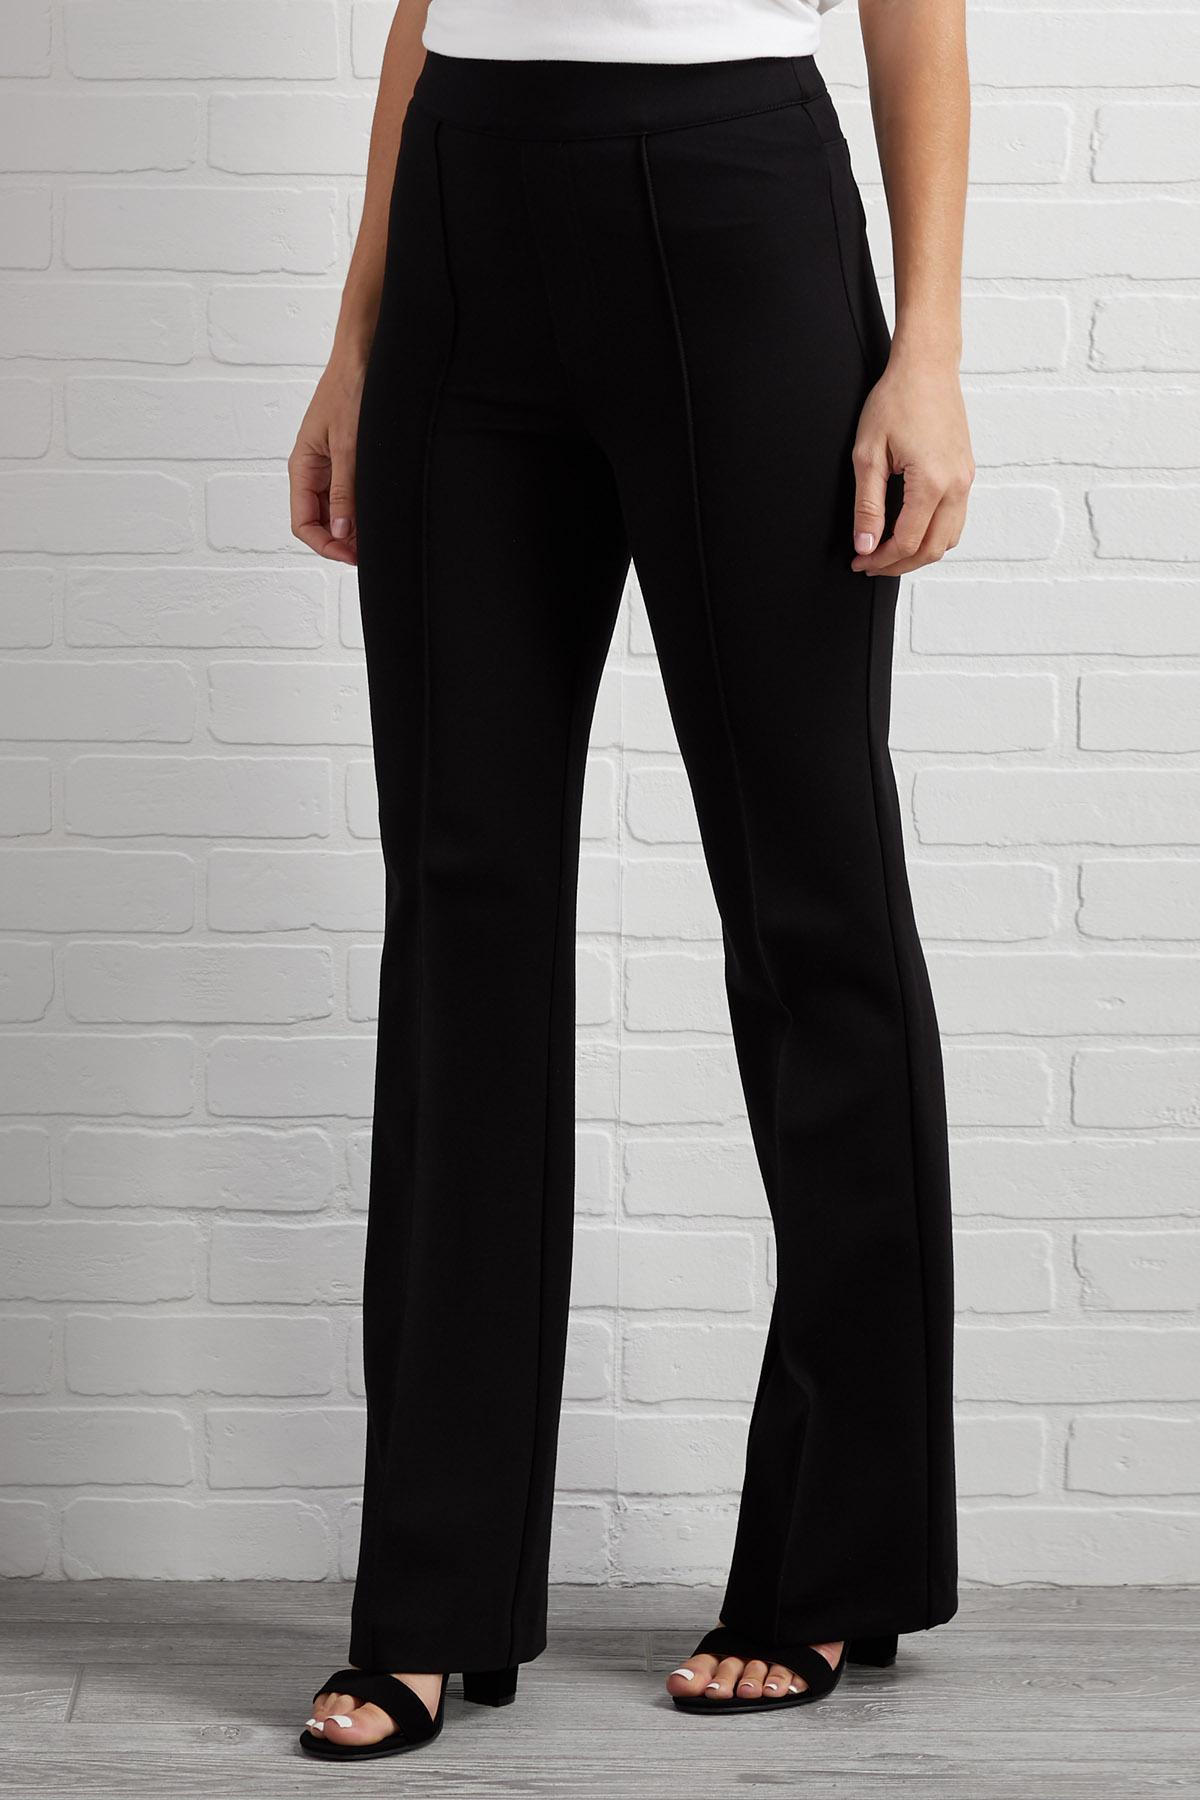 Nine To Five Pants - Tall